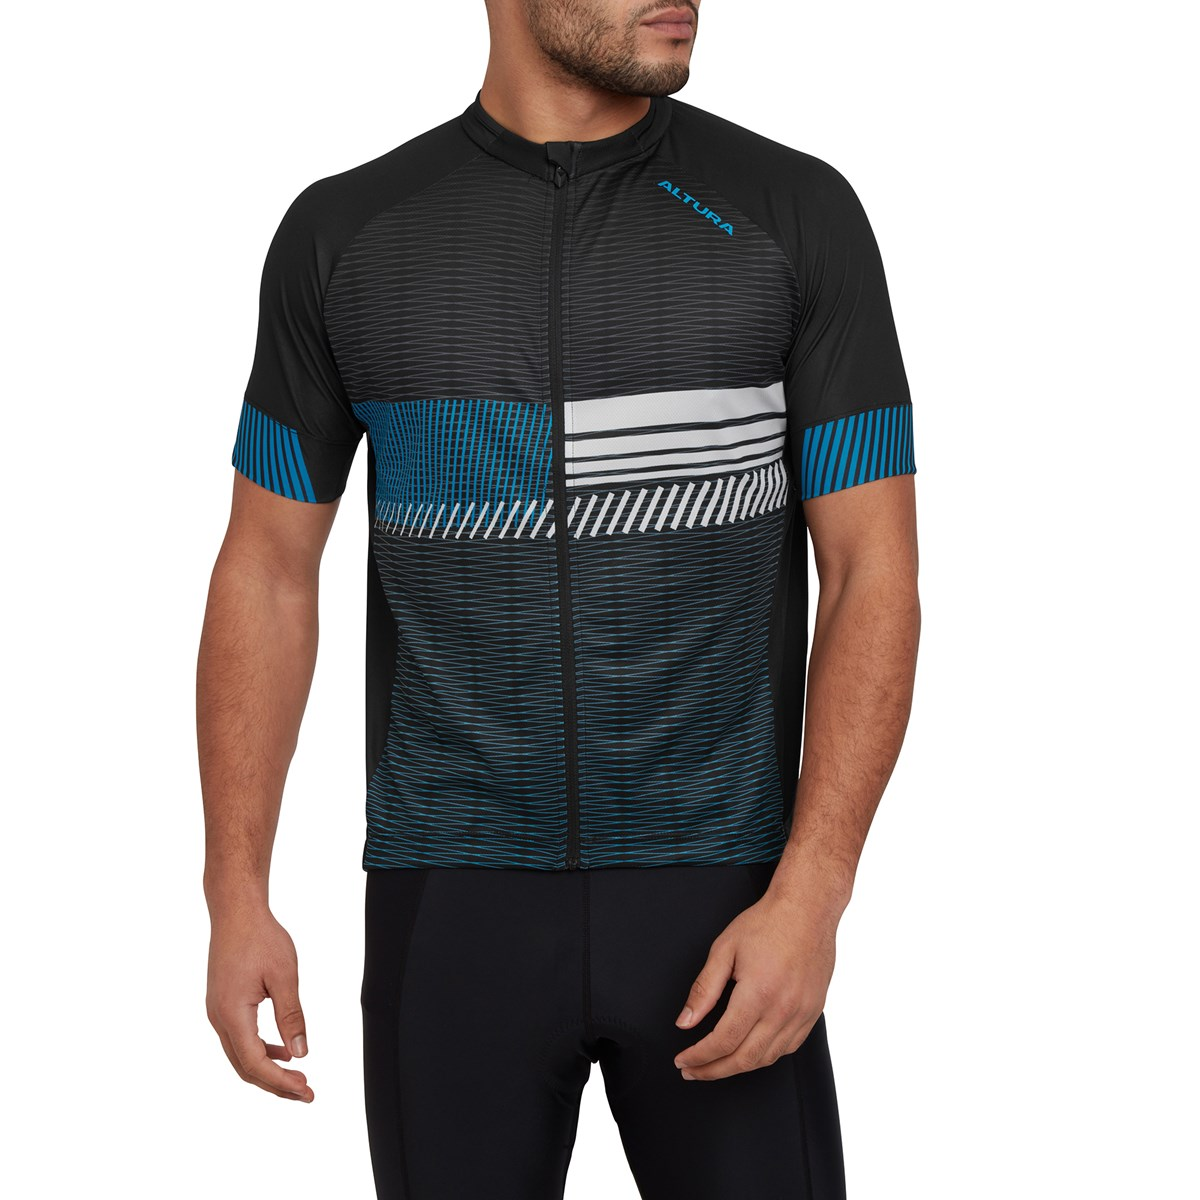 Club Men's Short Sleeve Jersey